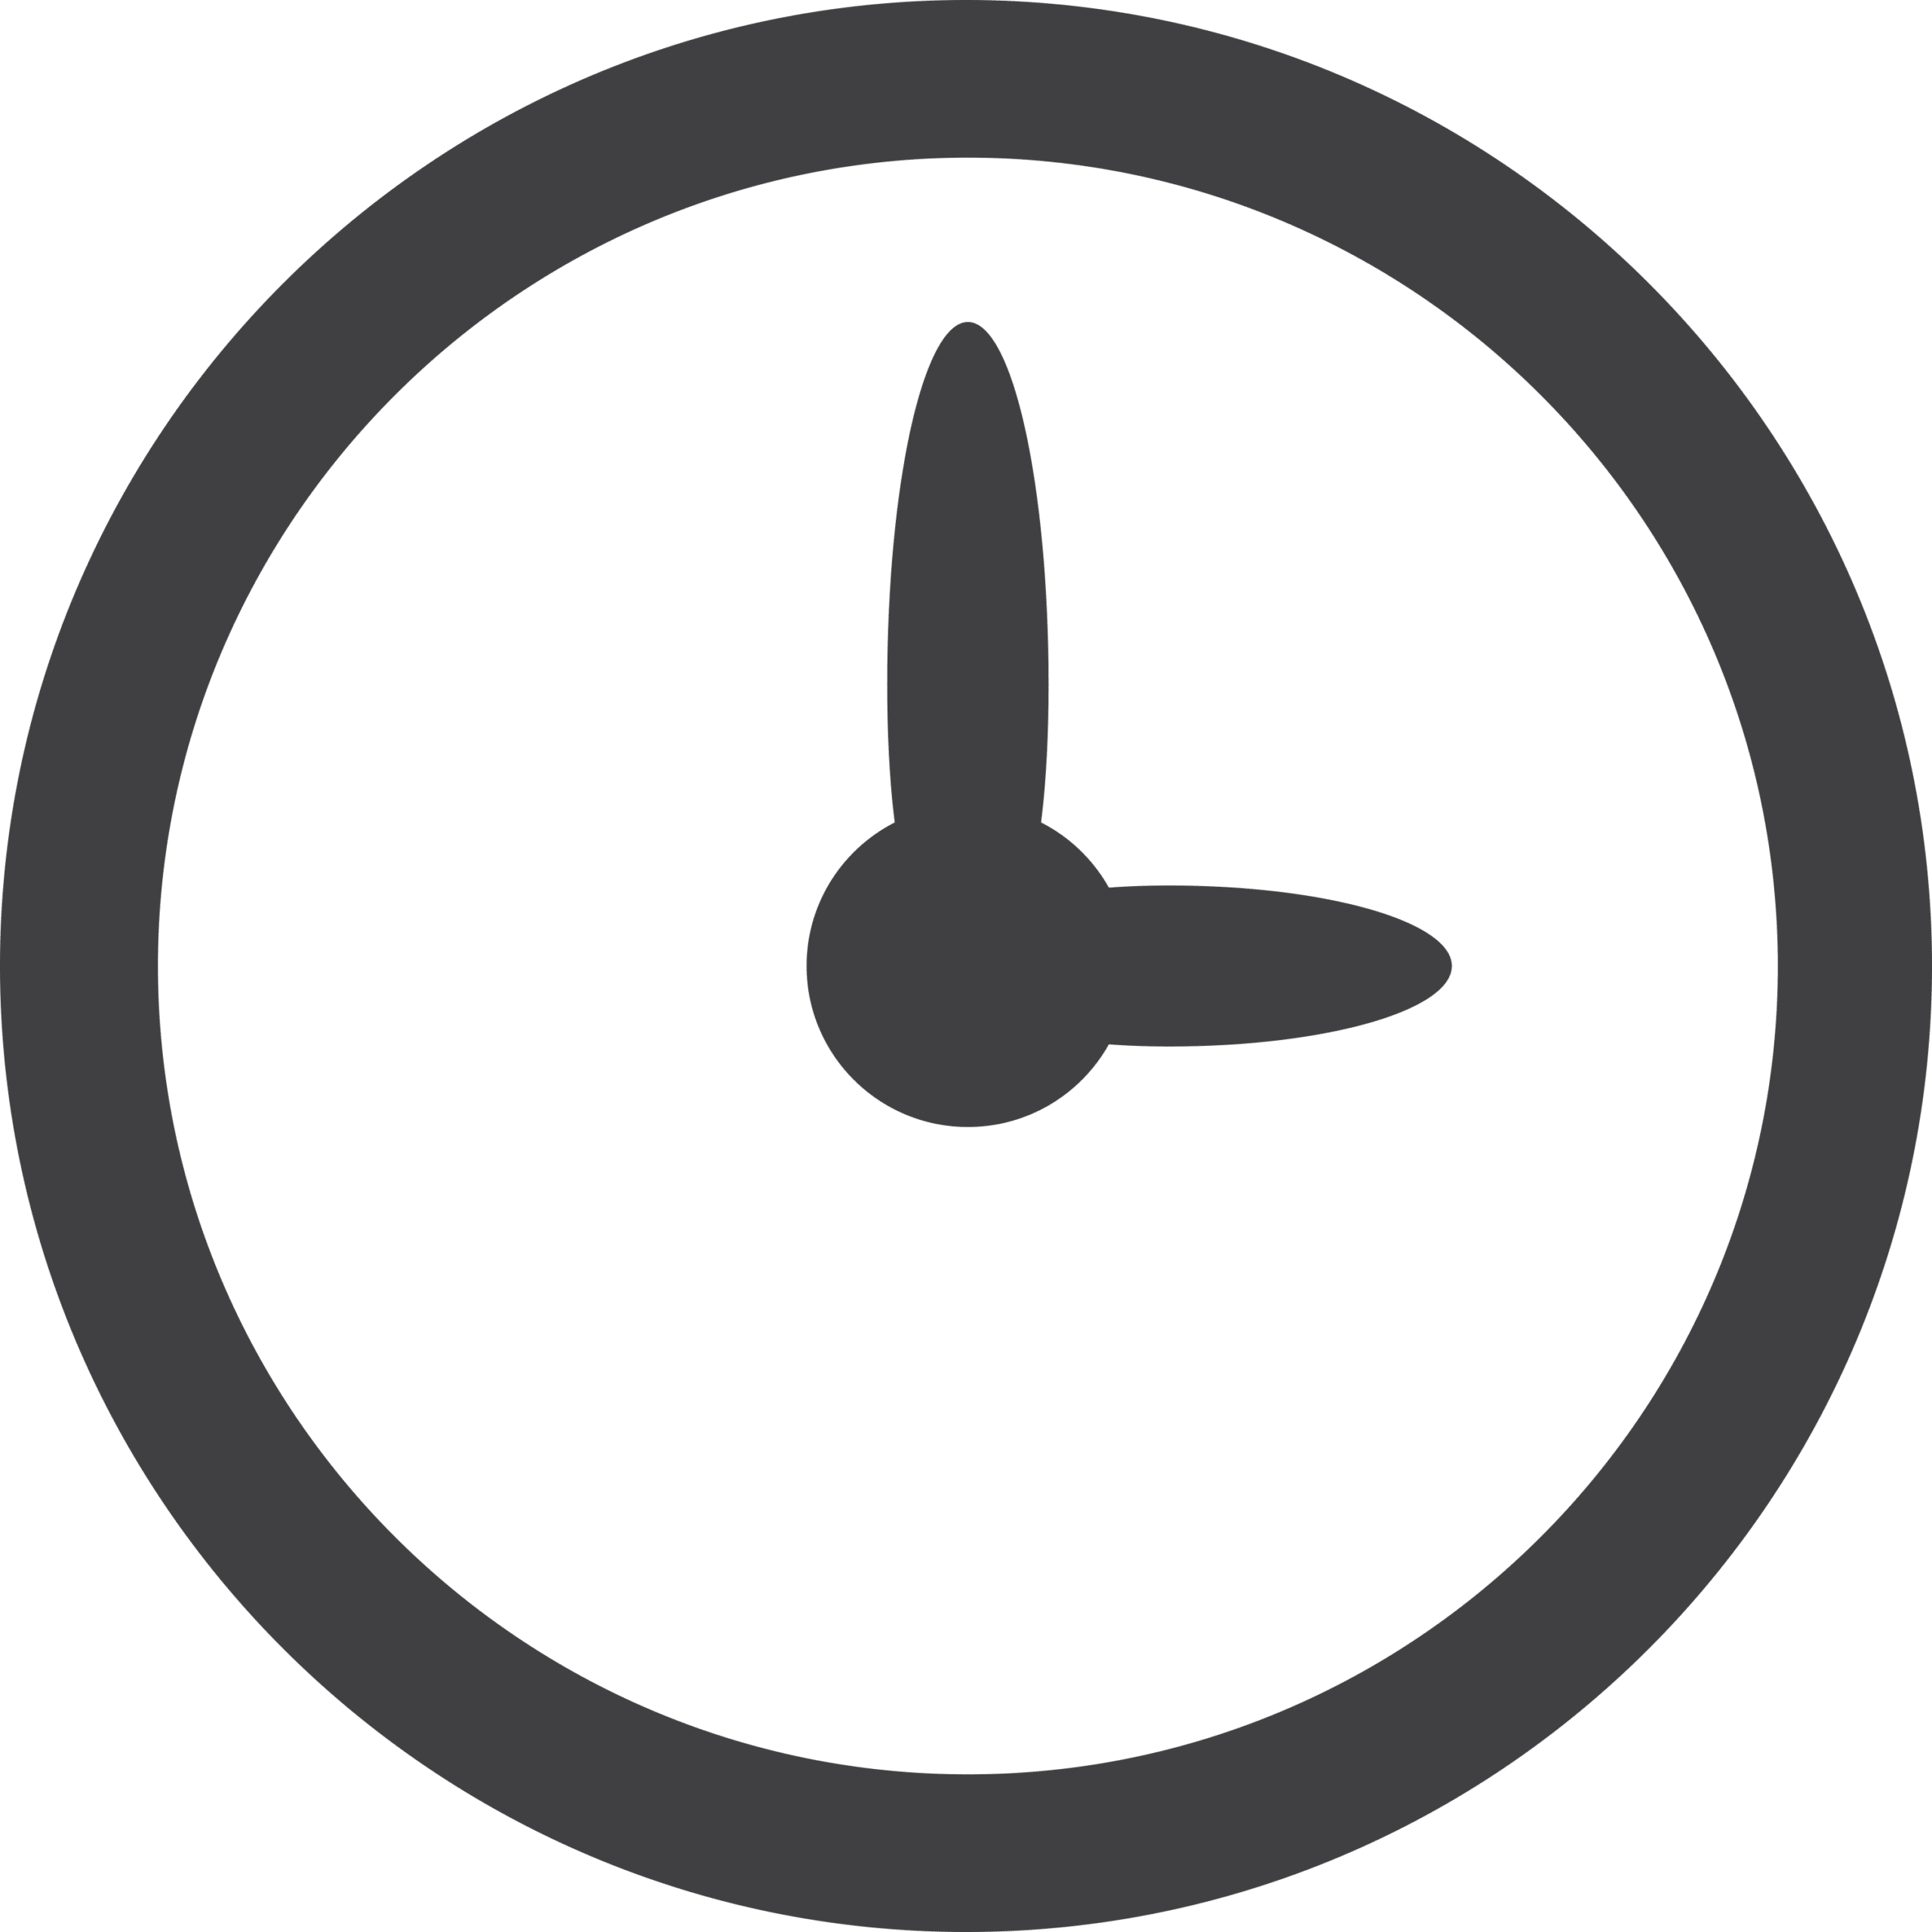 clock-face_icon